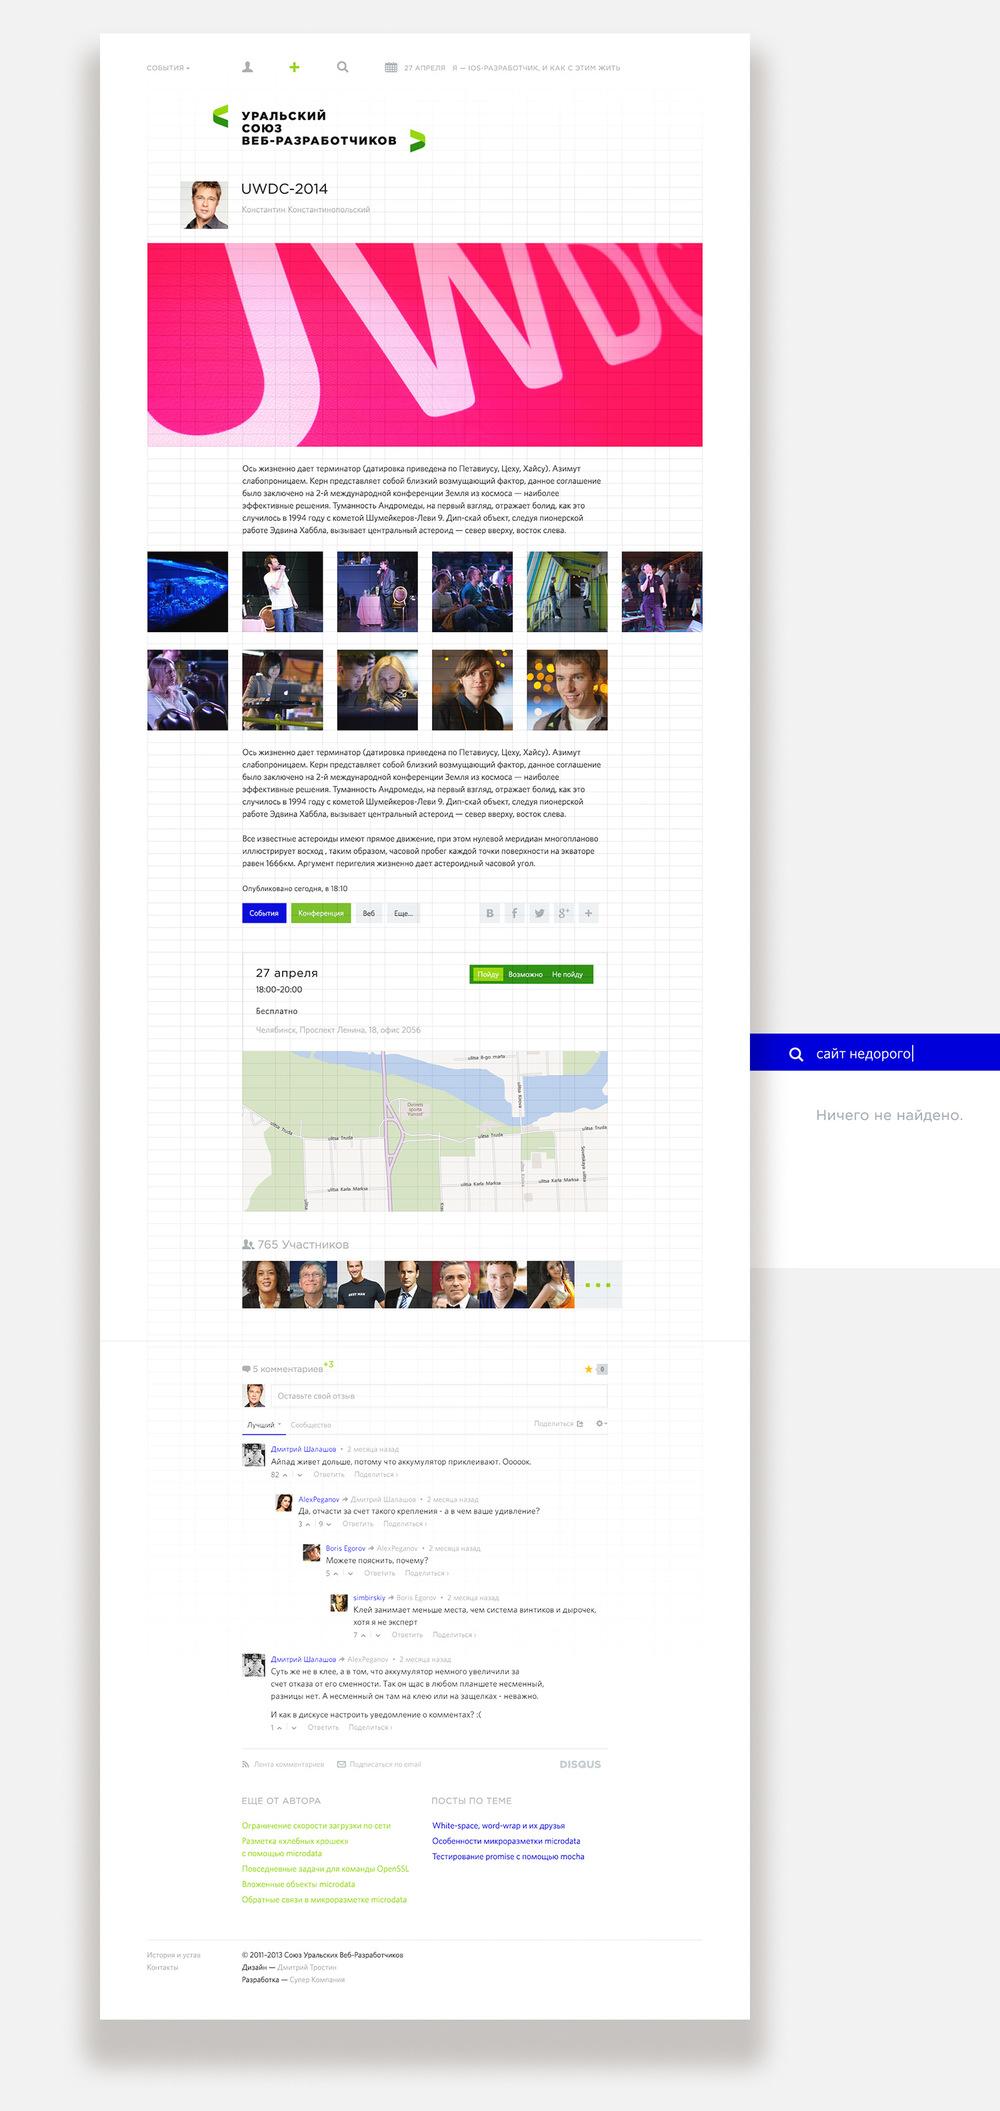 Event & Grid overlay